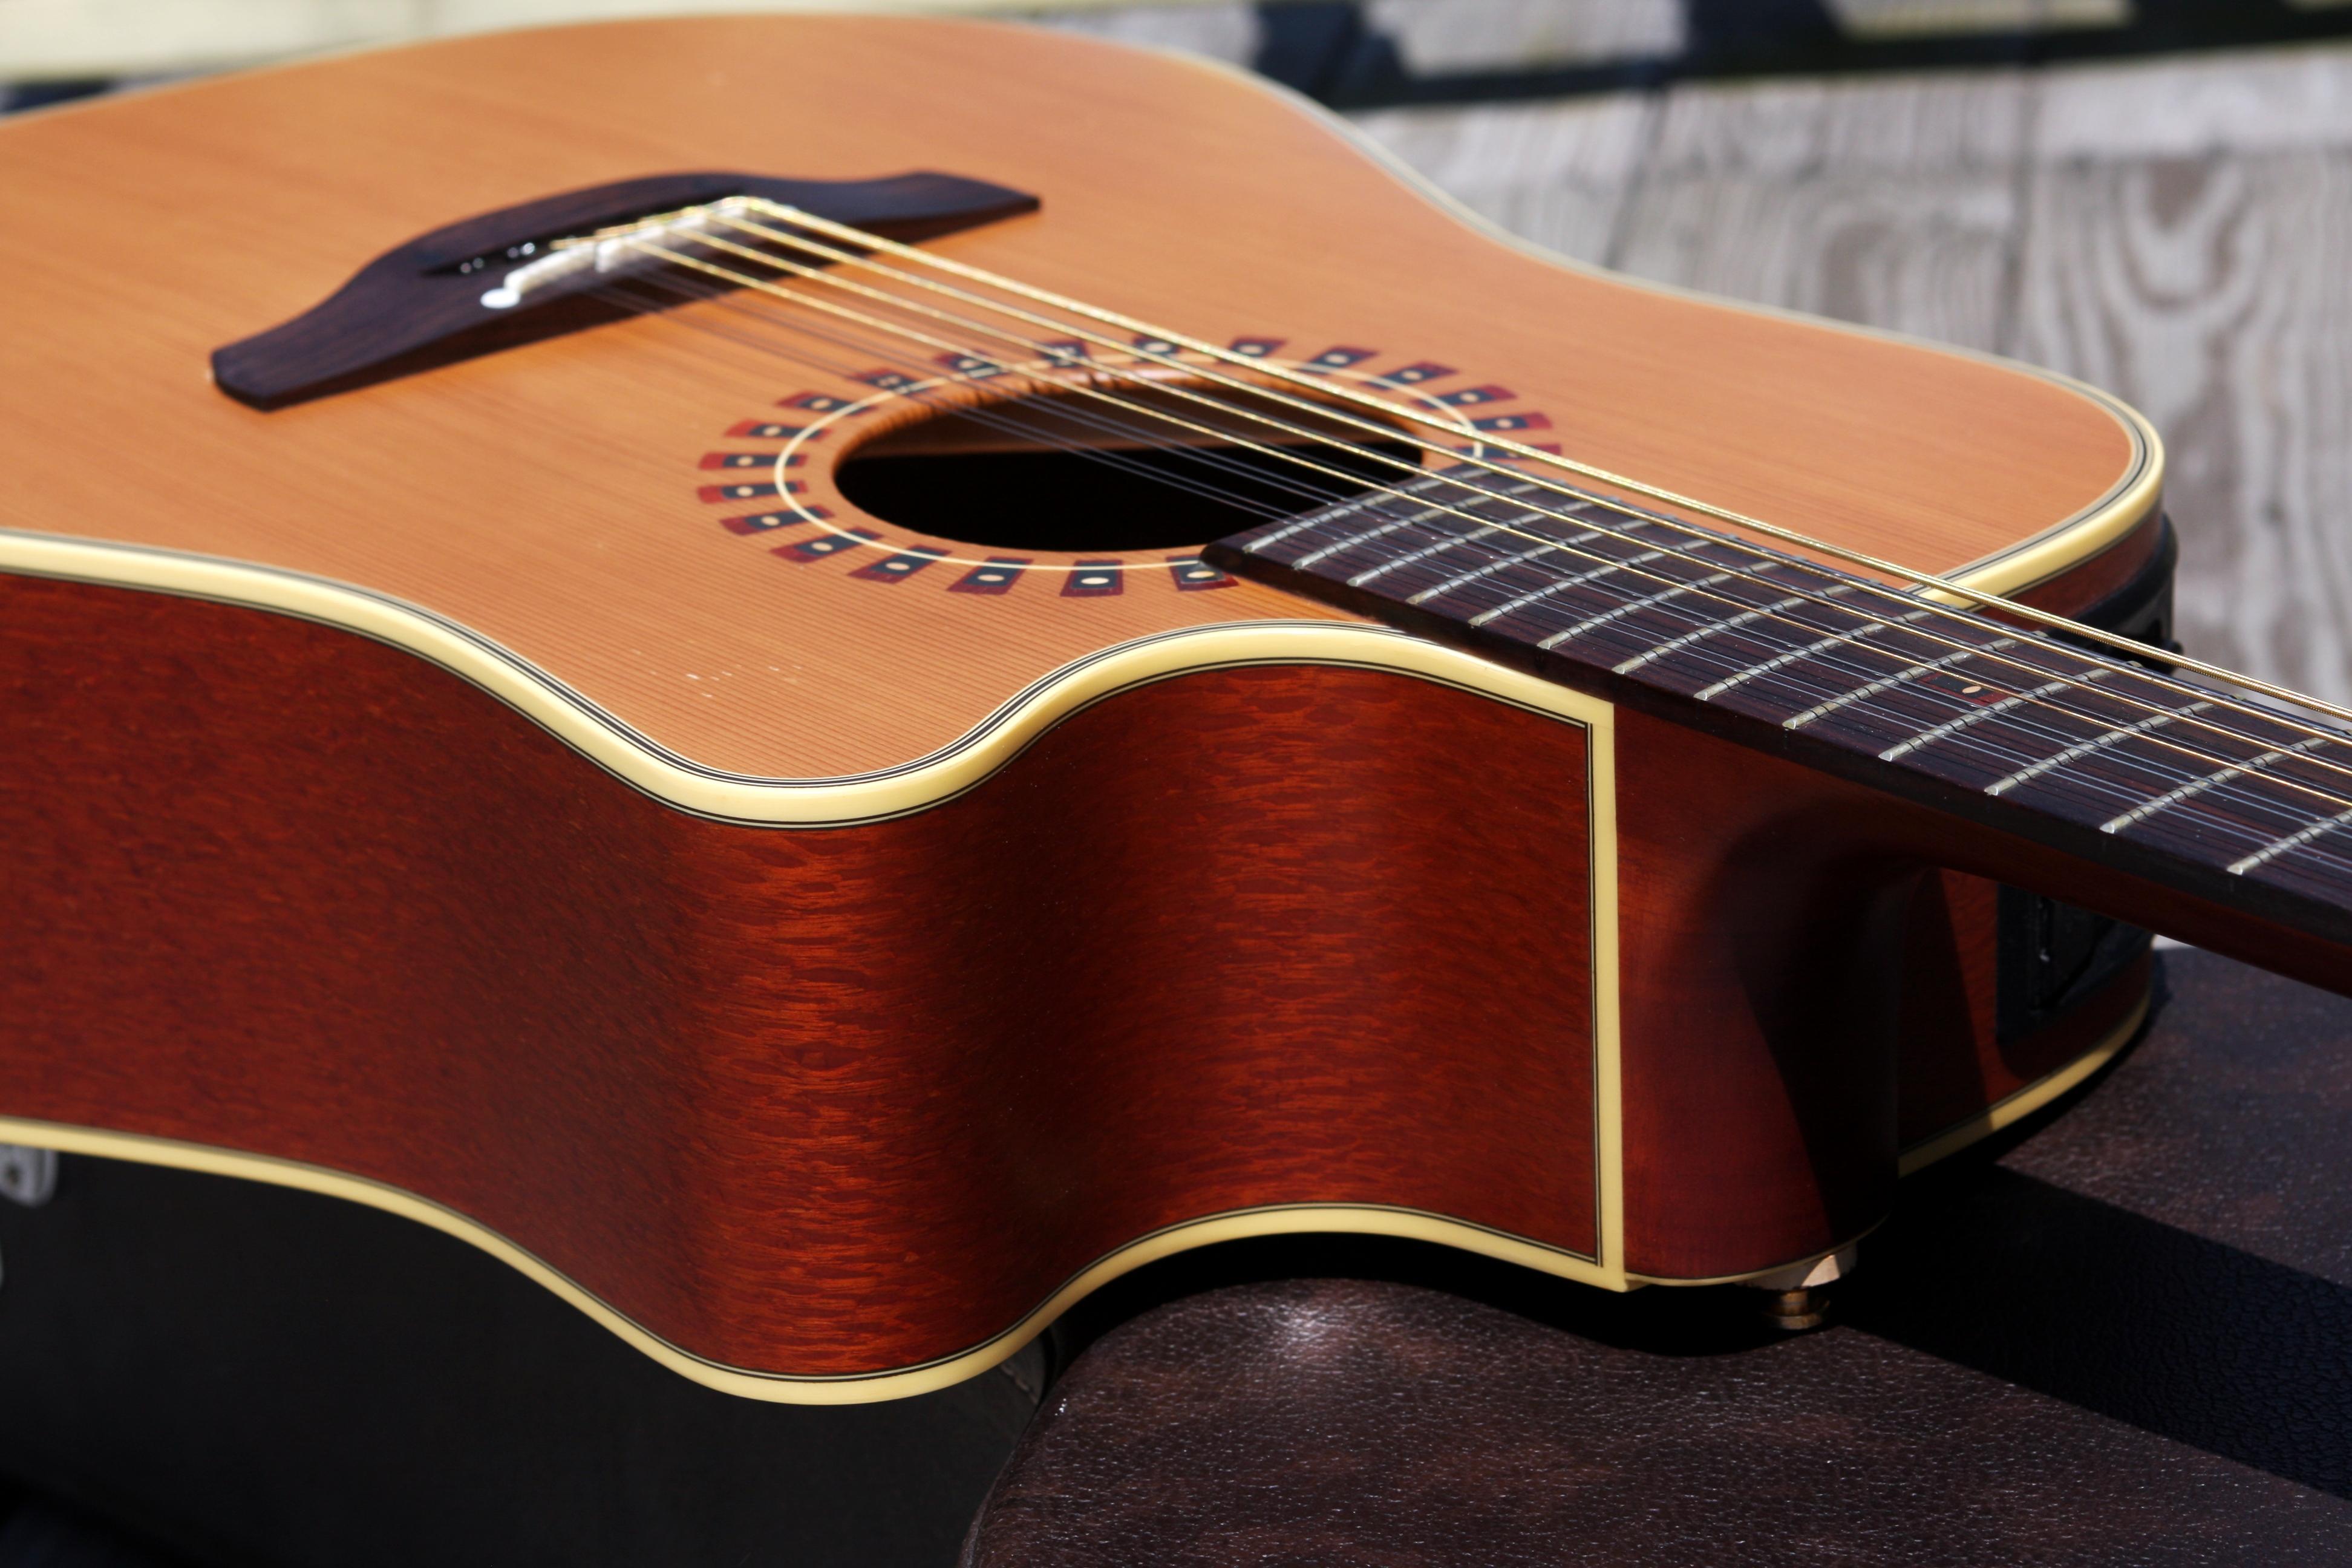 Ultimate Sdug Acoustic Preliminaries Page 2 Alvarez Electric Guitar Wiring Diagram Click For 3888x2592